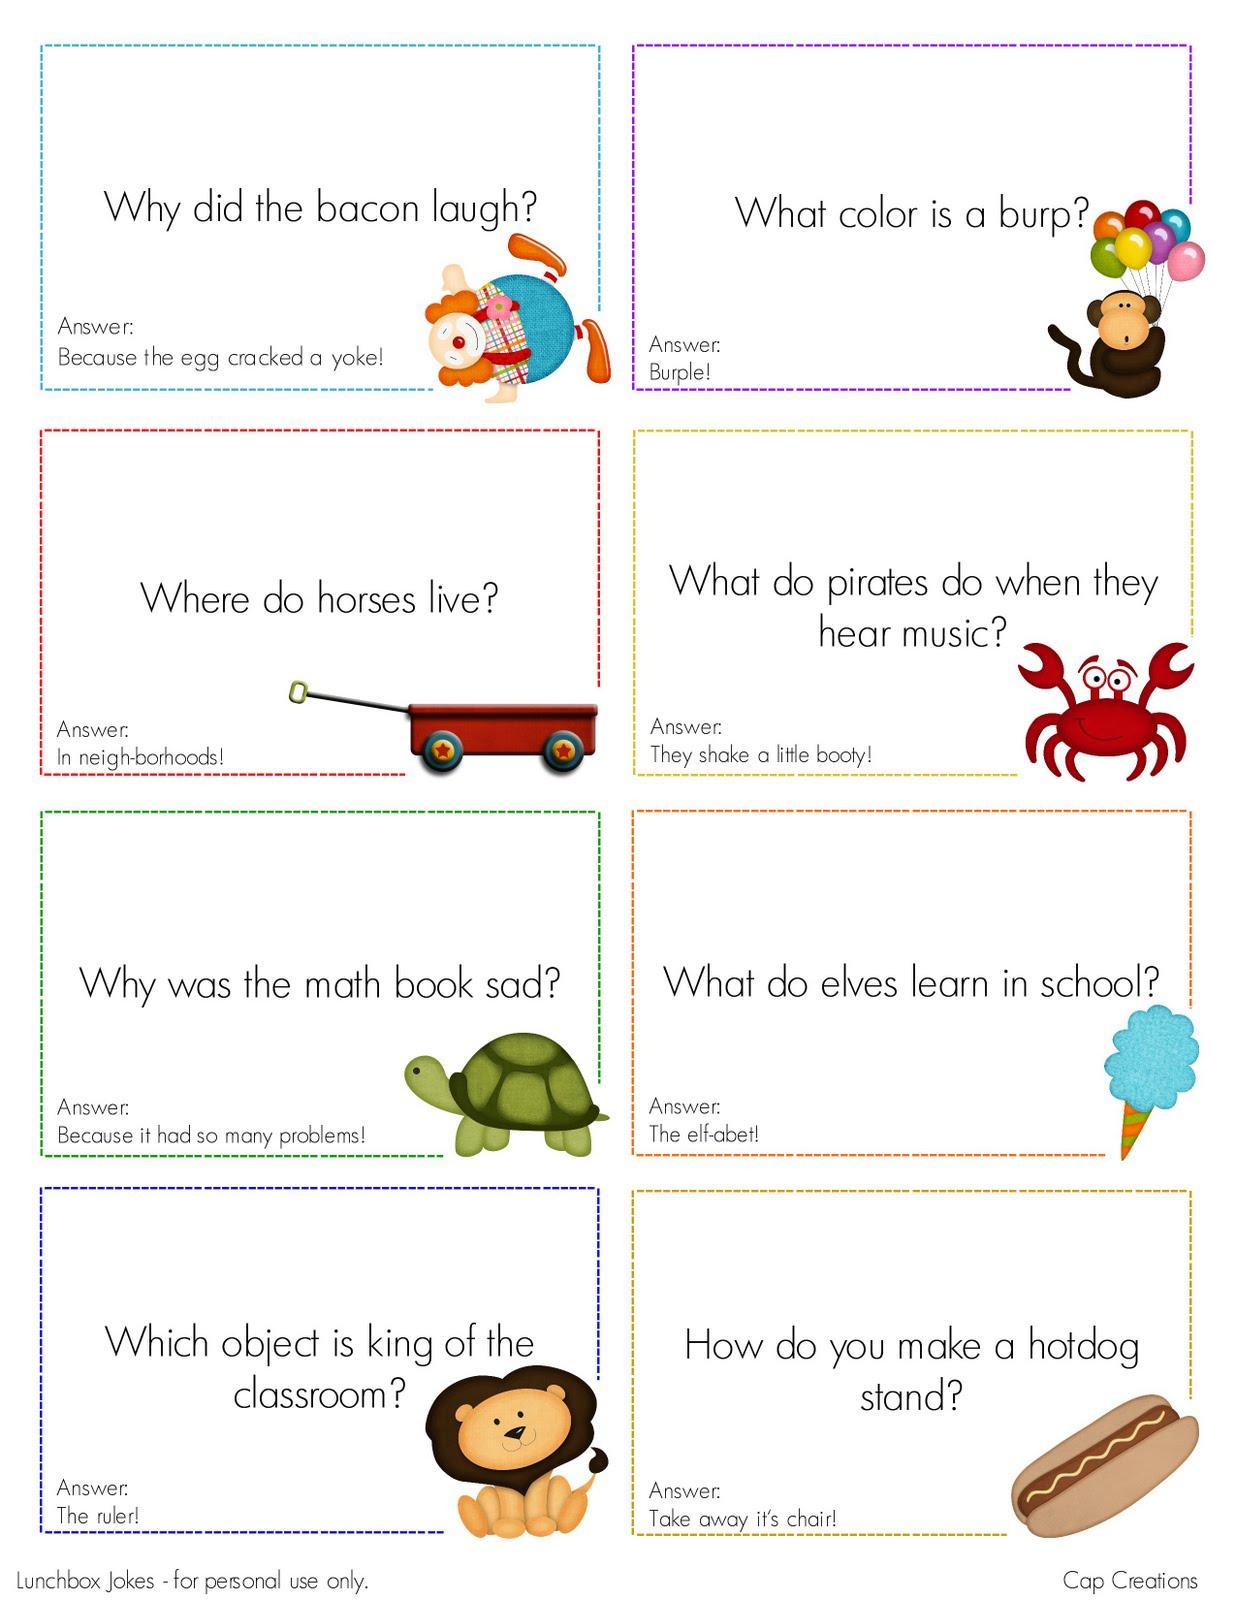 Cap Creations Free Printable Lunchbox Joke Cards